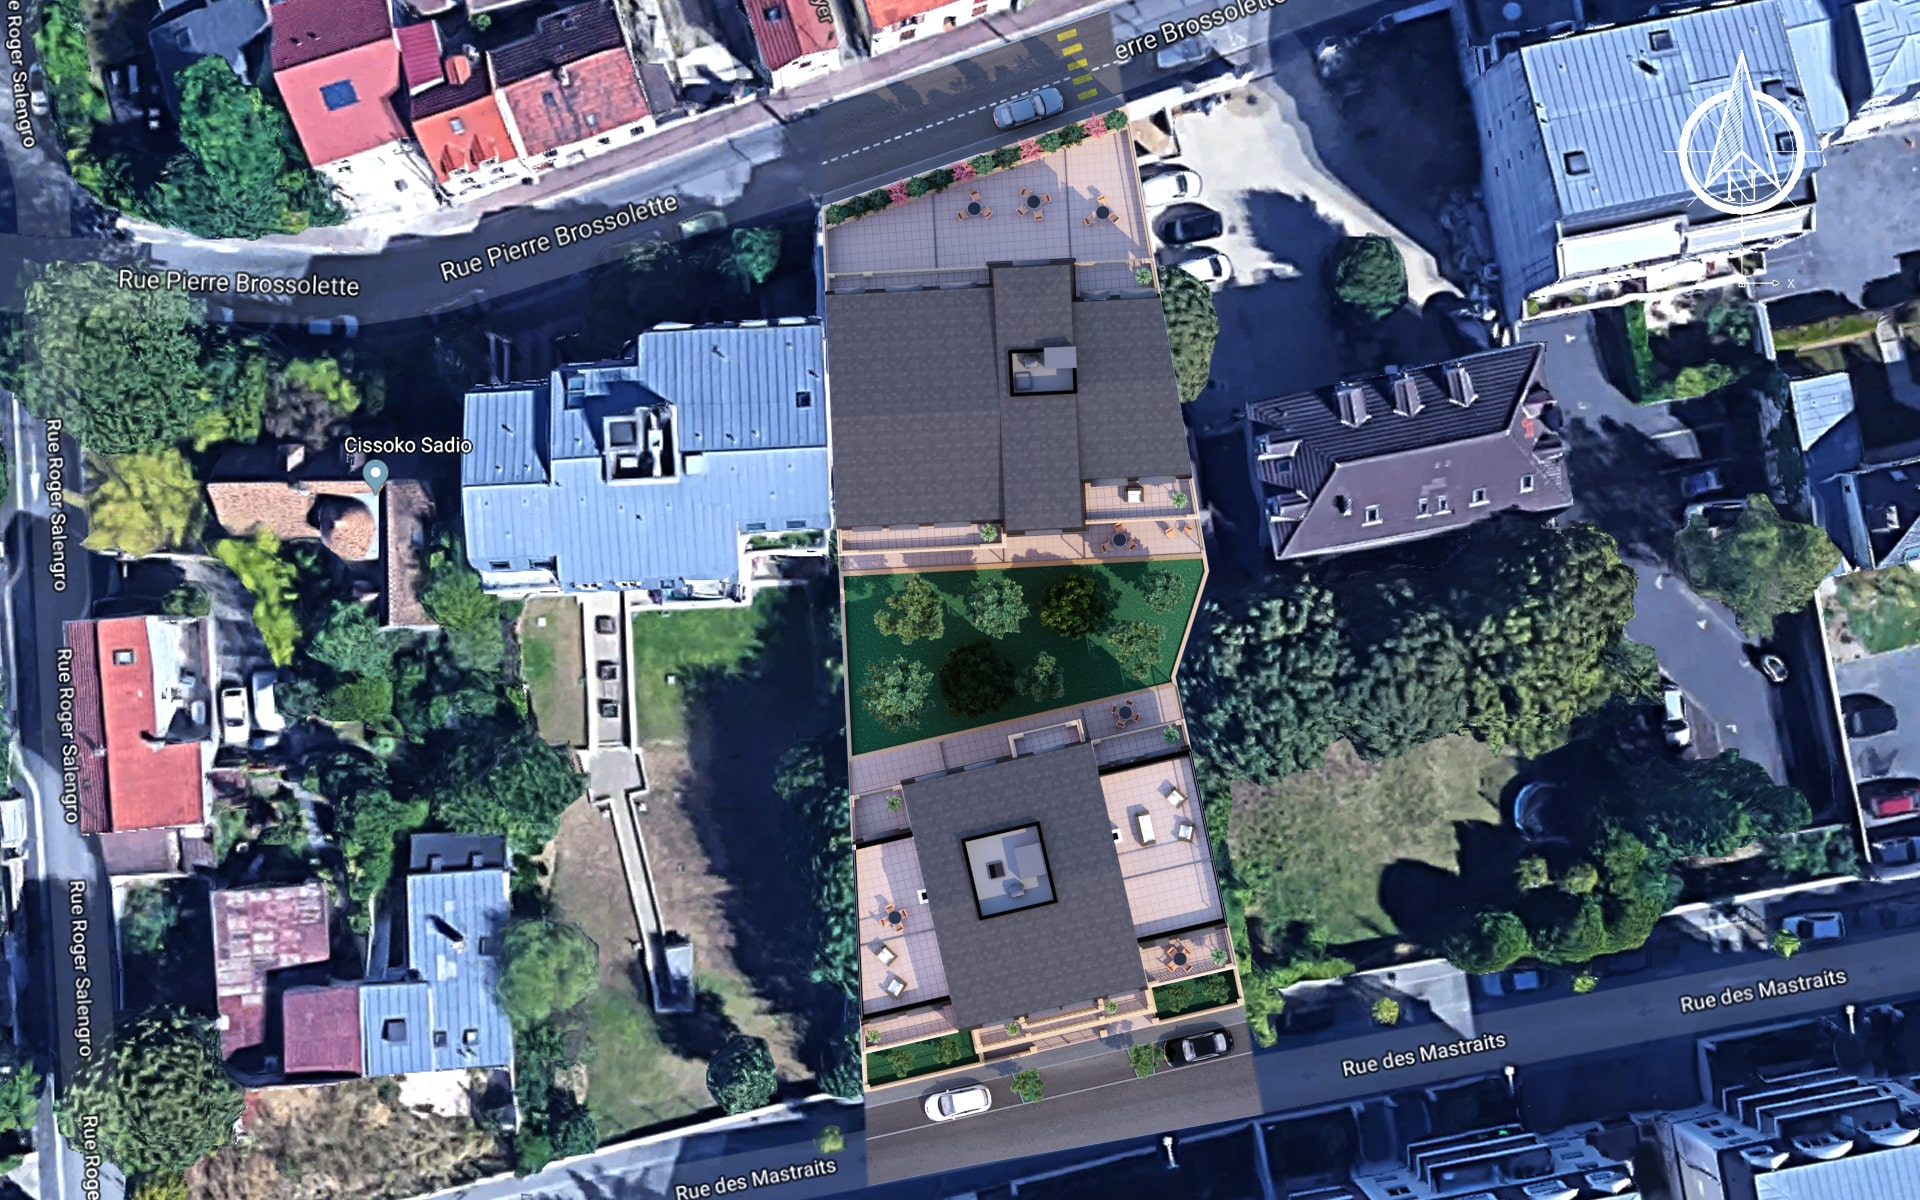 plan de masse 2D integration google maps - imagedoing